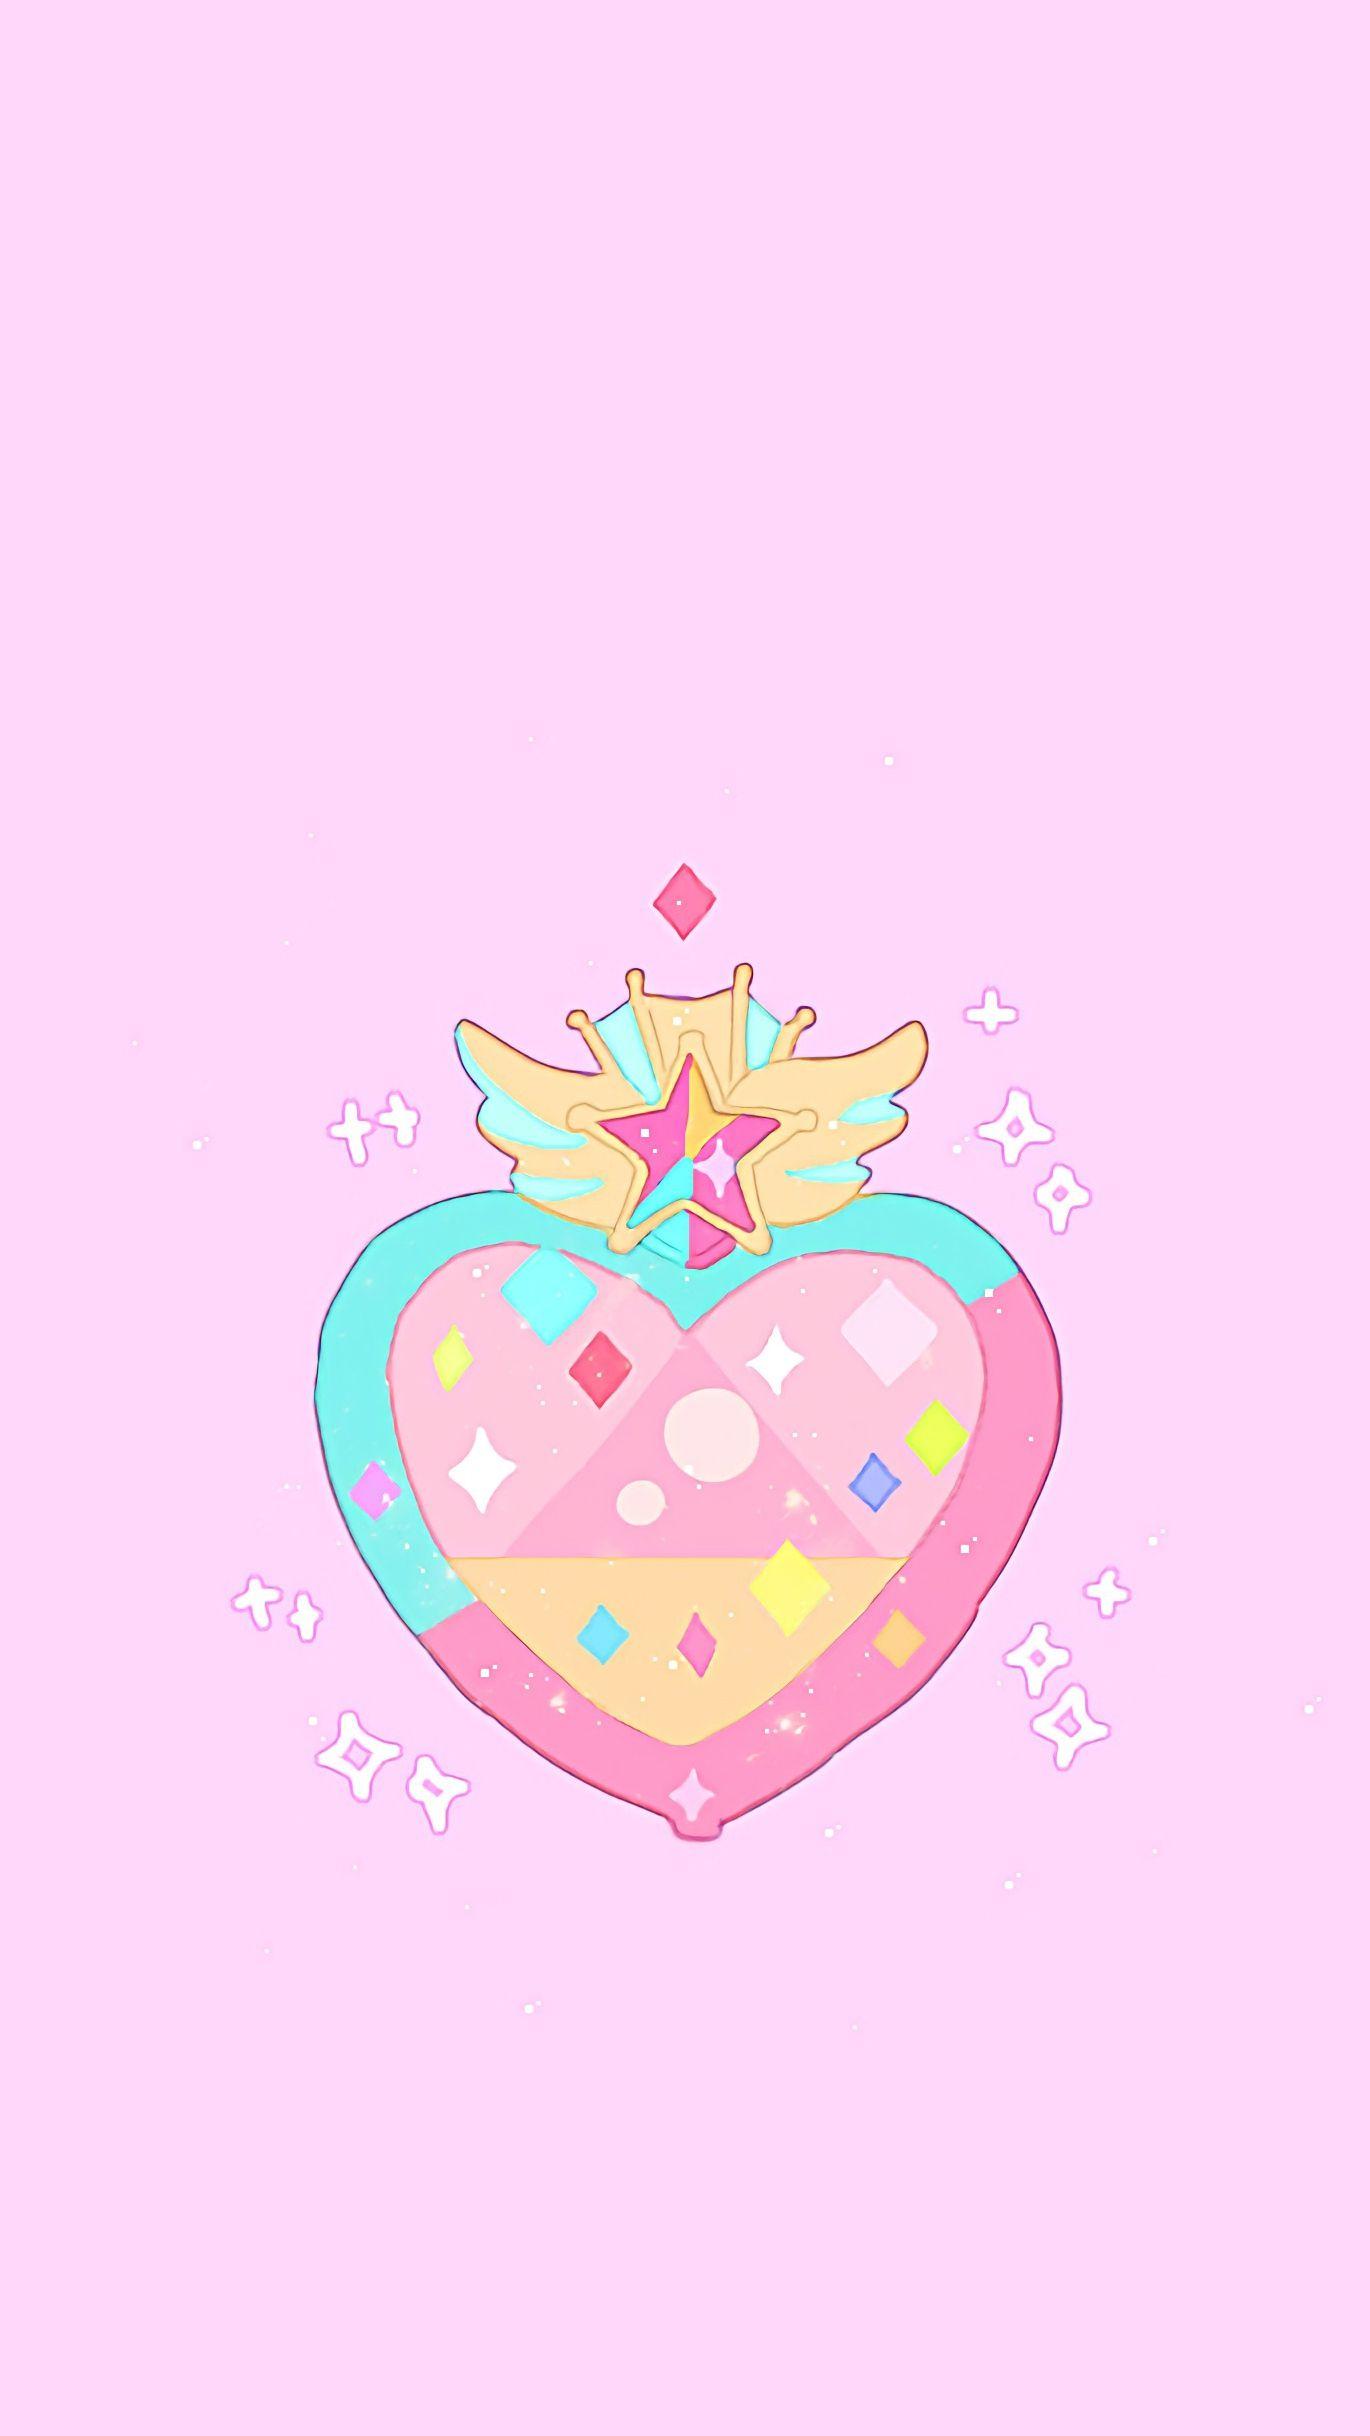 Sailor Moon Heart Sailor Moon Wallpaper Sailor Moon Aesthetic Sailor Moon